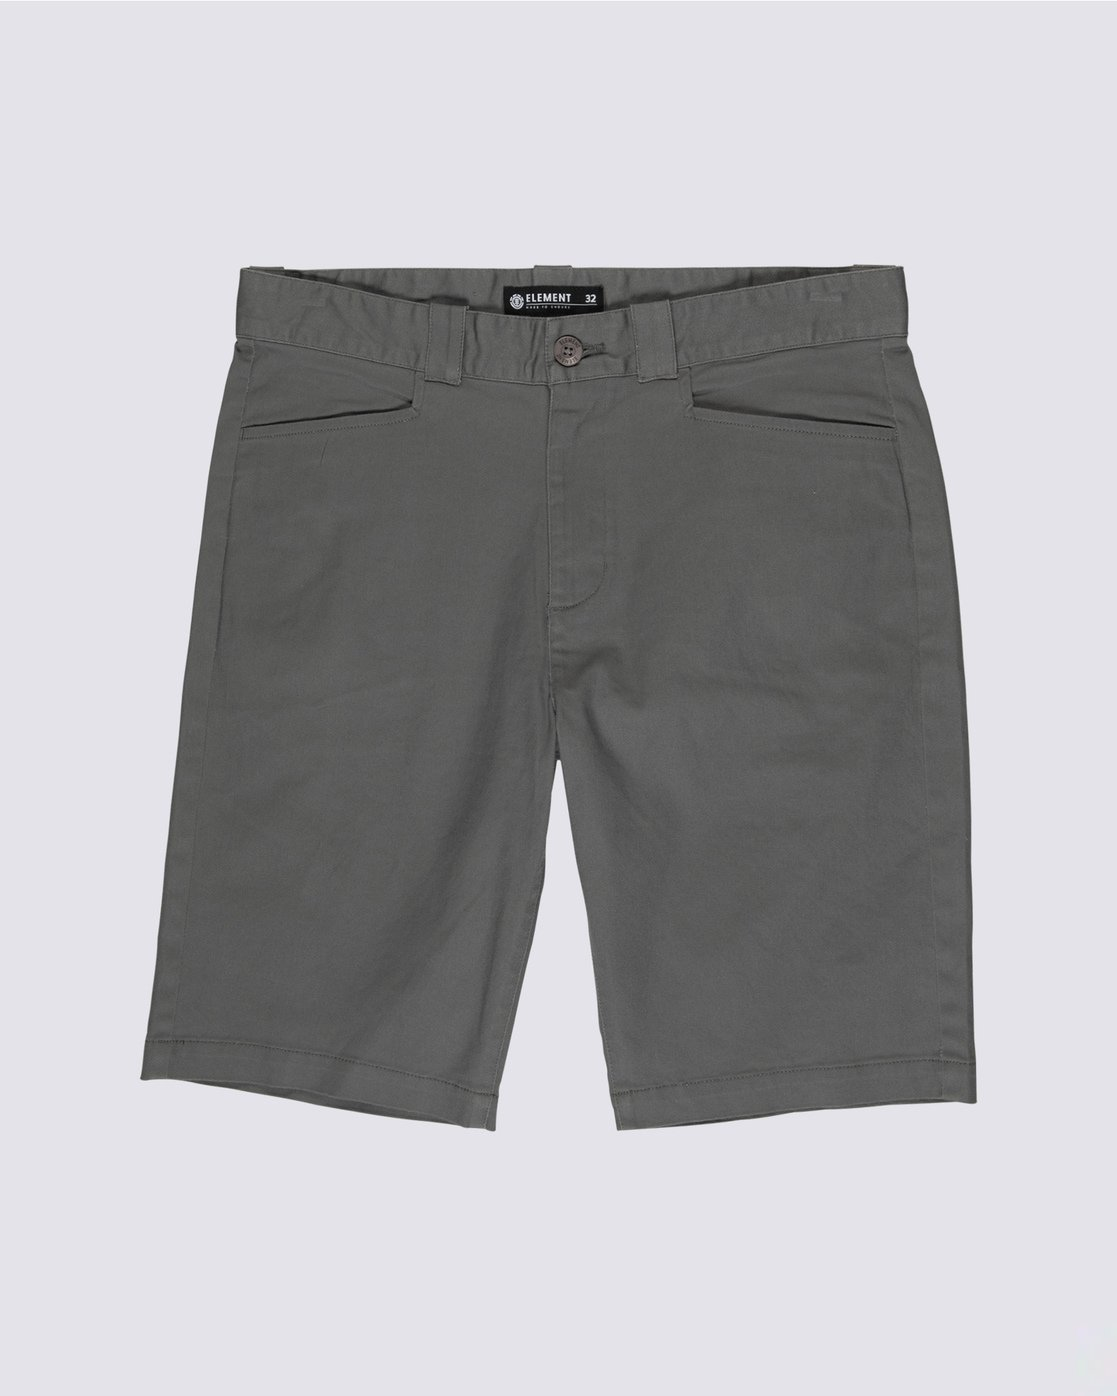 0 Sawyer Shorts Grey M245TESW Element